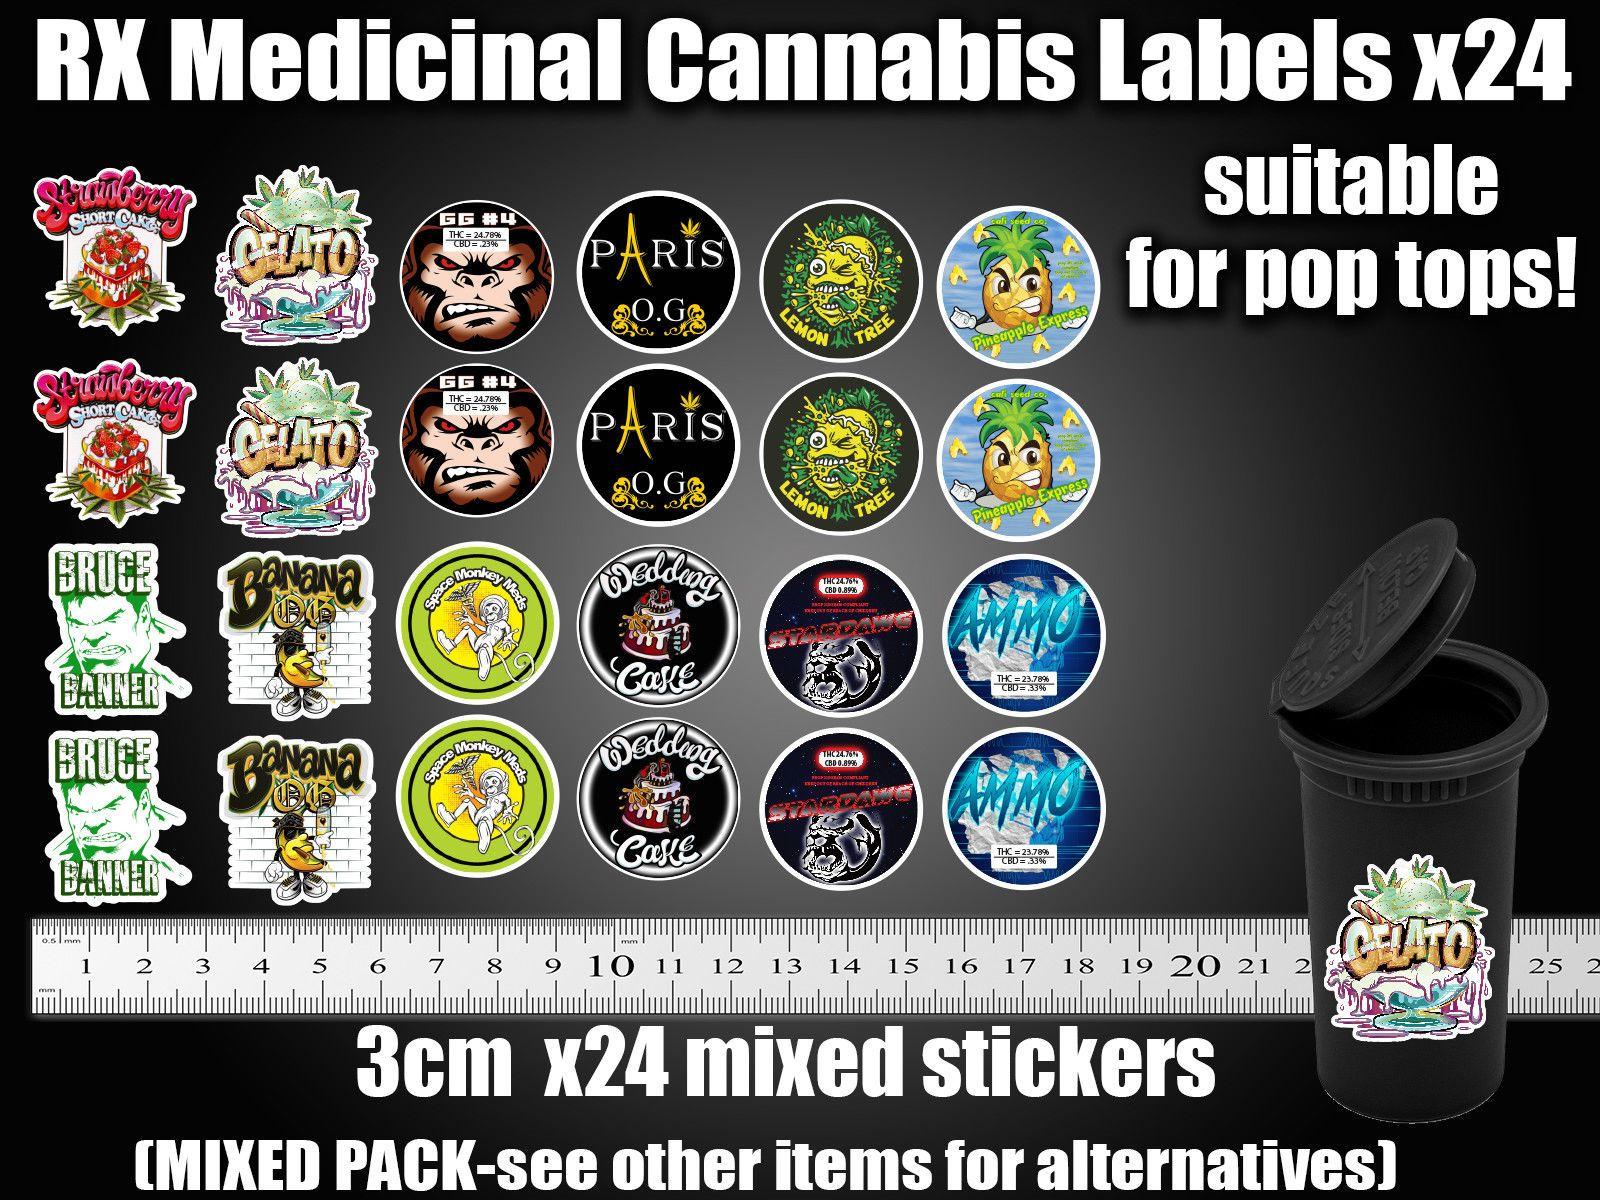 MIXED CALI Cannabis Labels 13 19 Dram pop top JAR TIN RX Medical Marijuana  weed